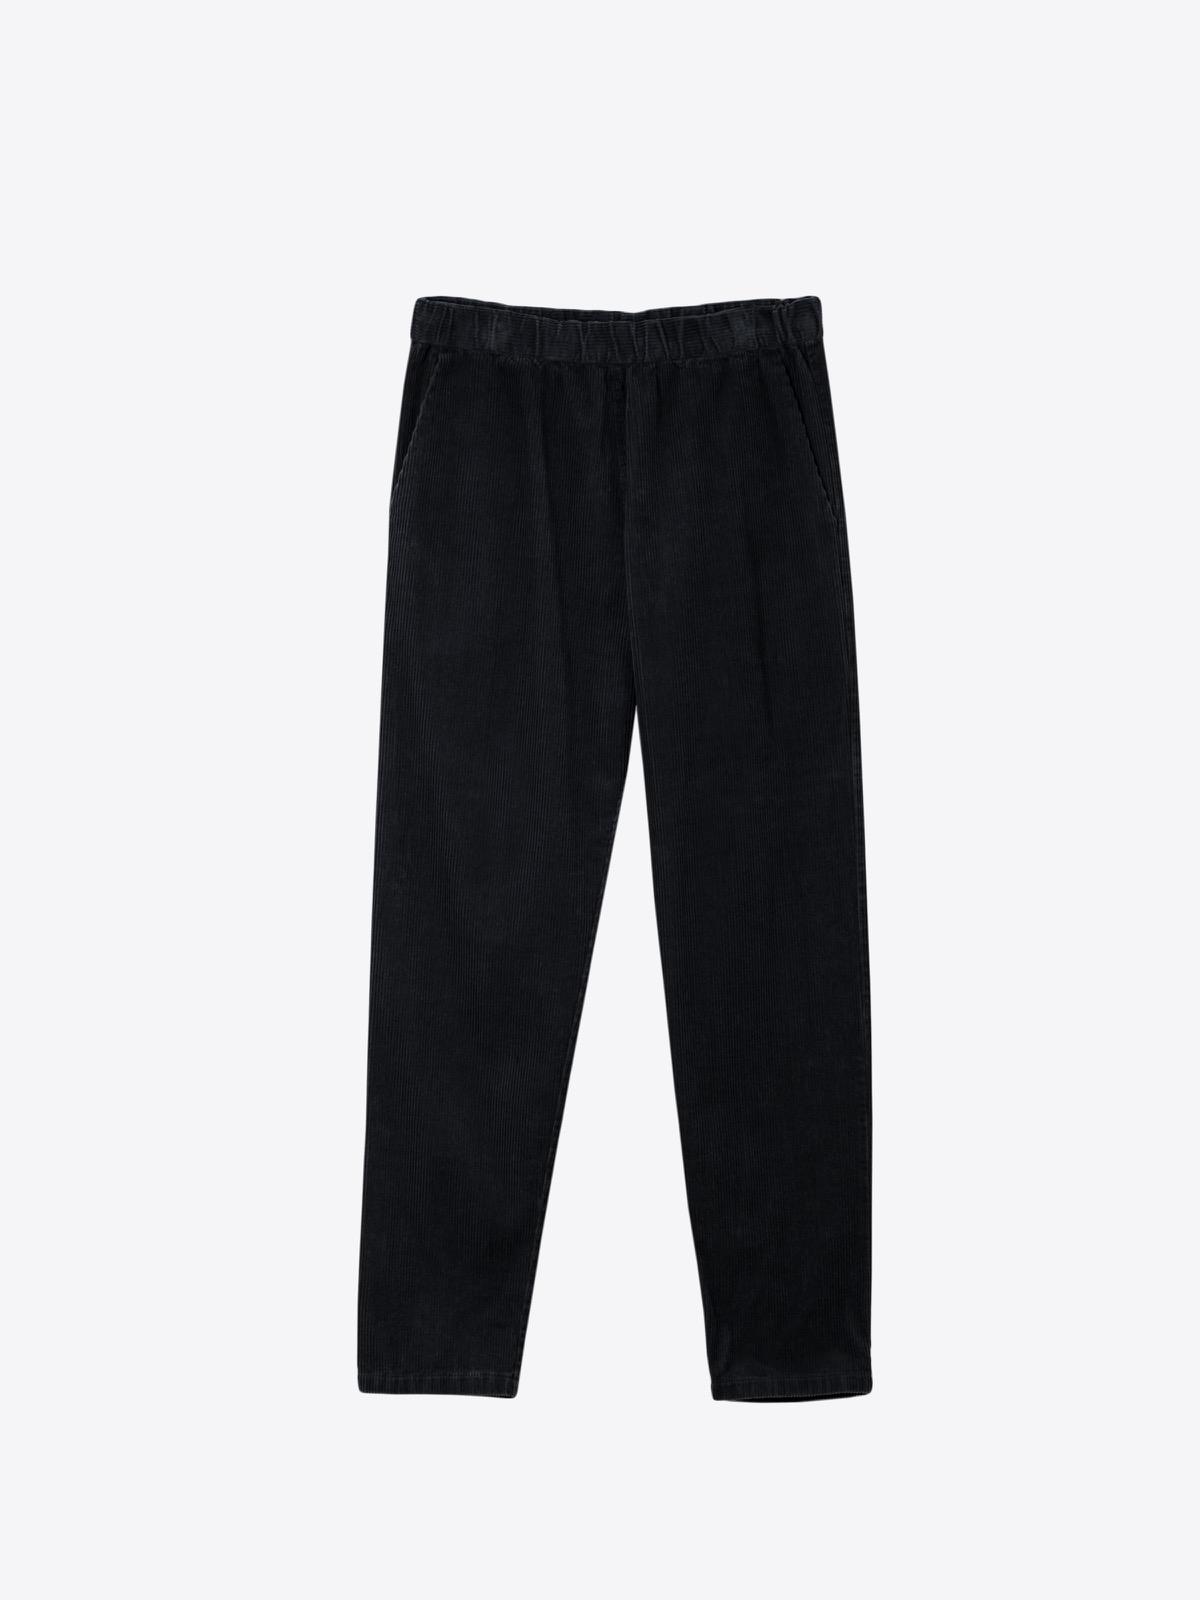 A2 012 | washed soft corduroy | black